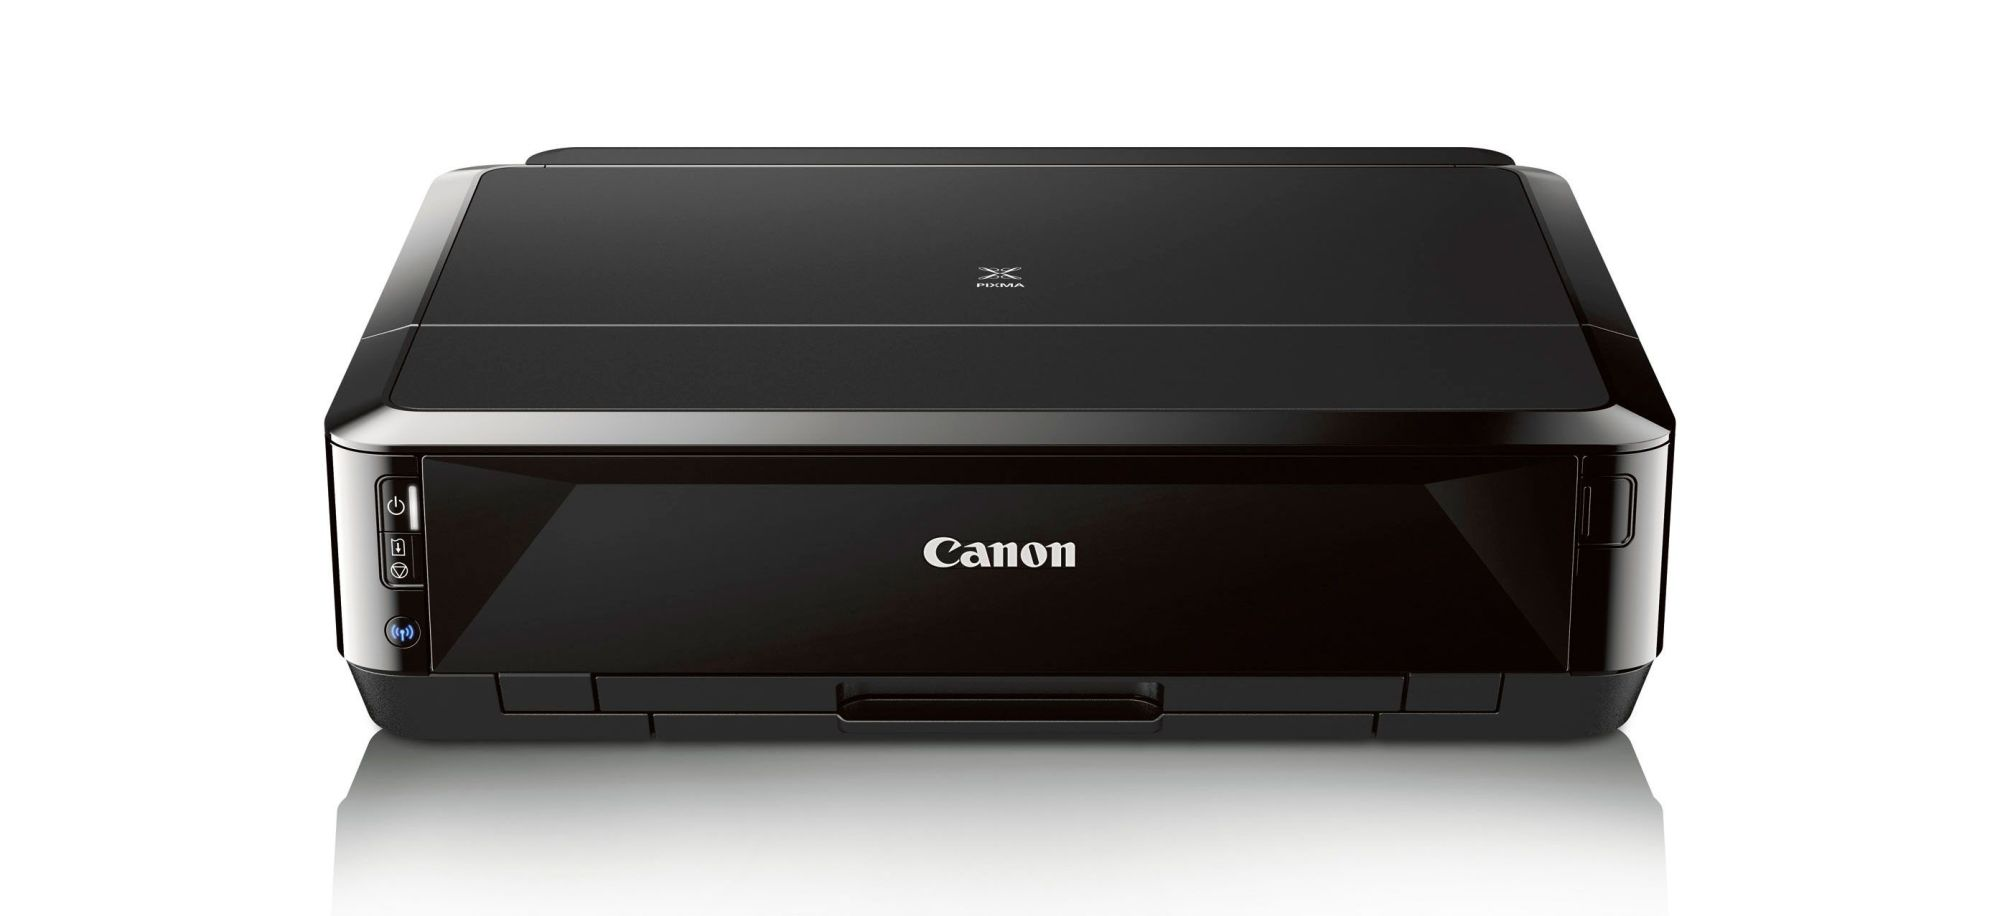 hight resolution of pixma ip7220 wireless inkjet photo printer